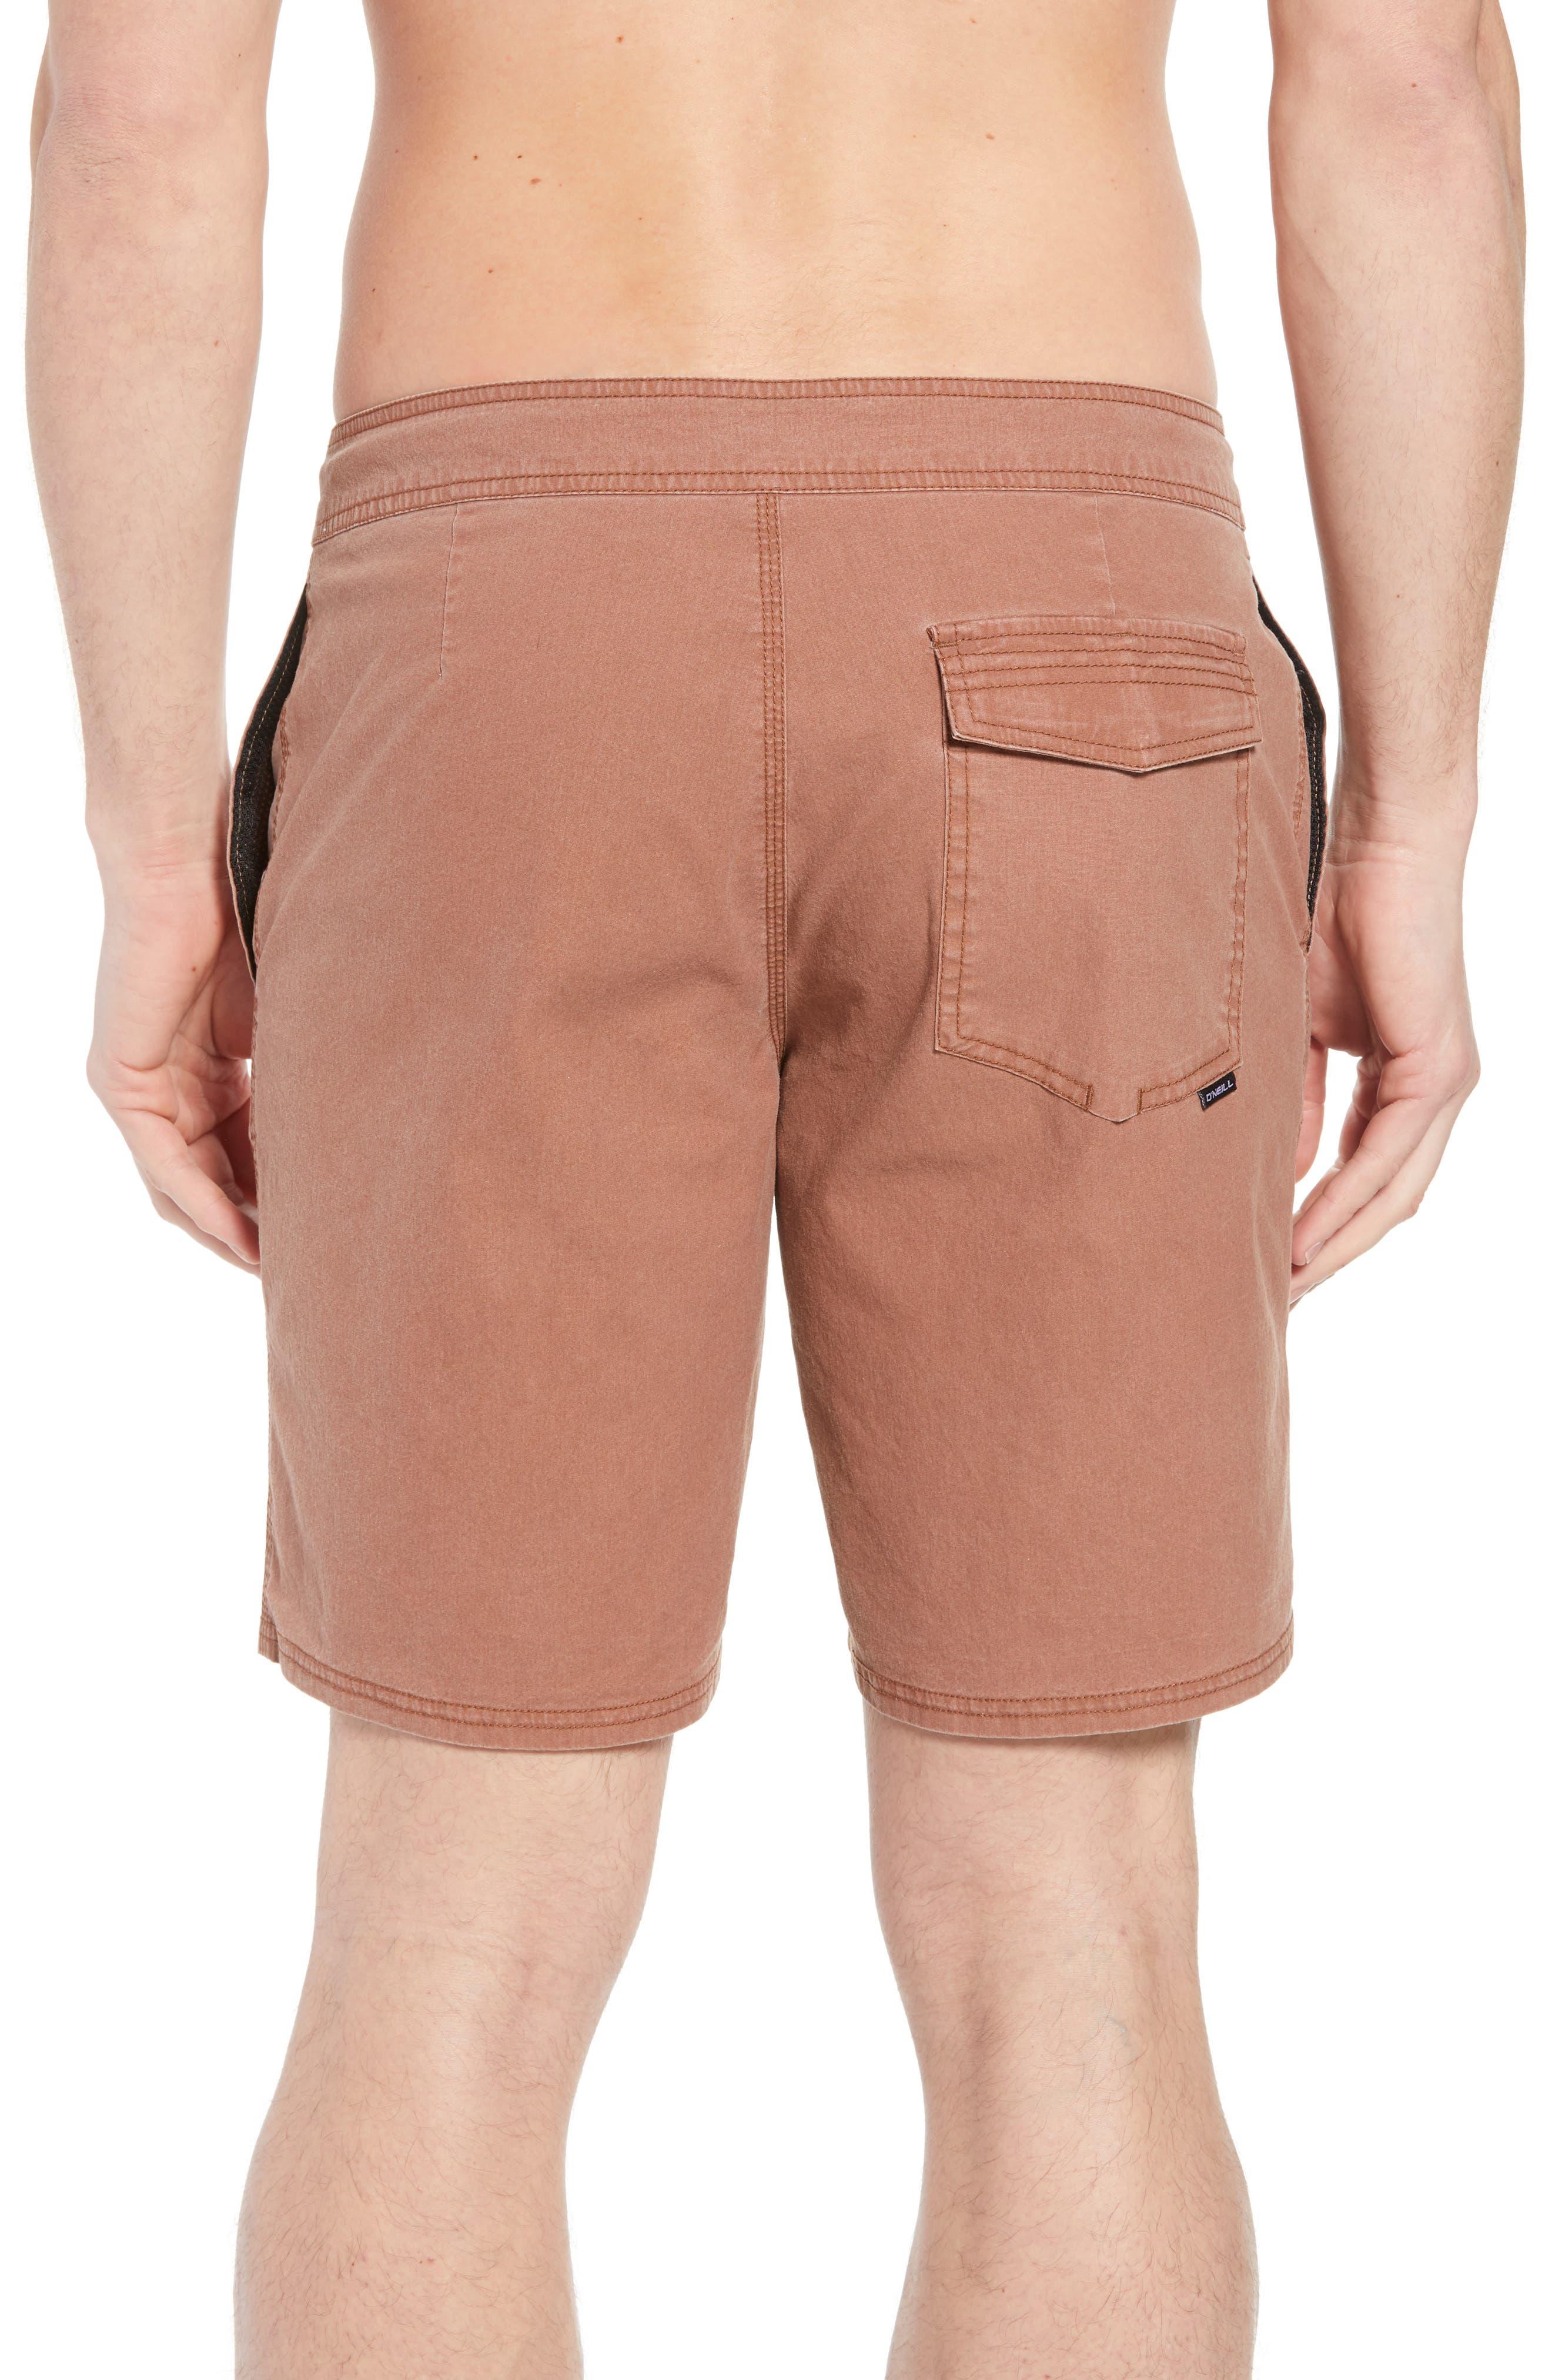 Faded Cruzer Board Shorts,                             Alternate thumbnail 2, color,